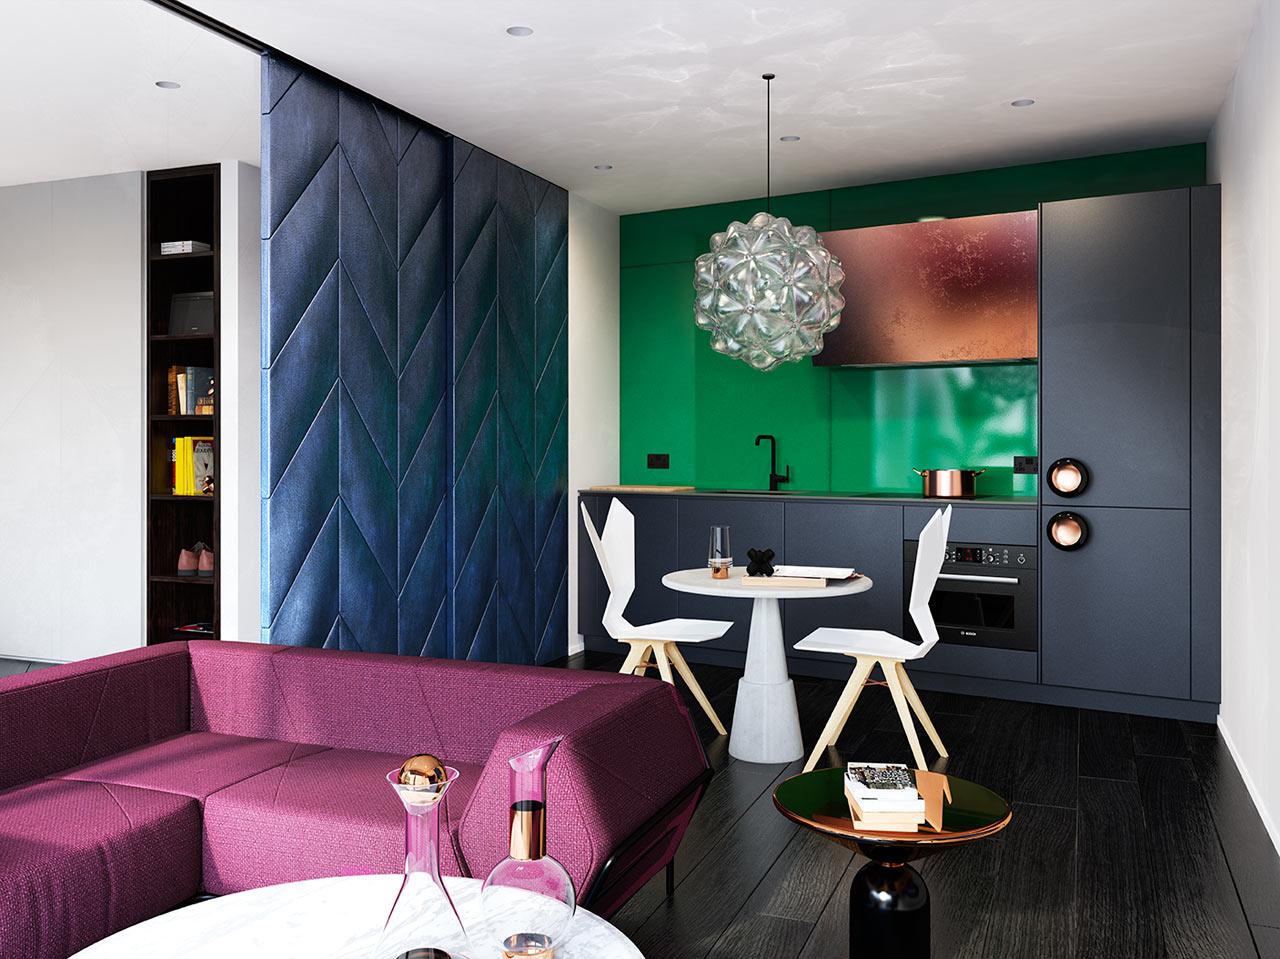 tom dixon design research 12 design milk. Black Bedroom Furniture Sets. Home Design Ideas